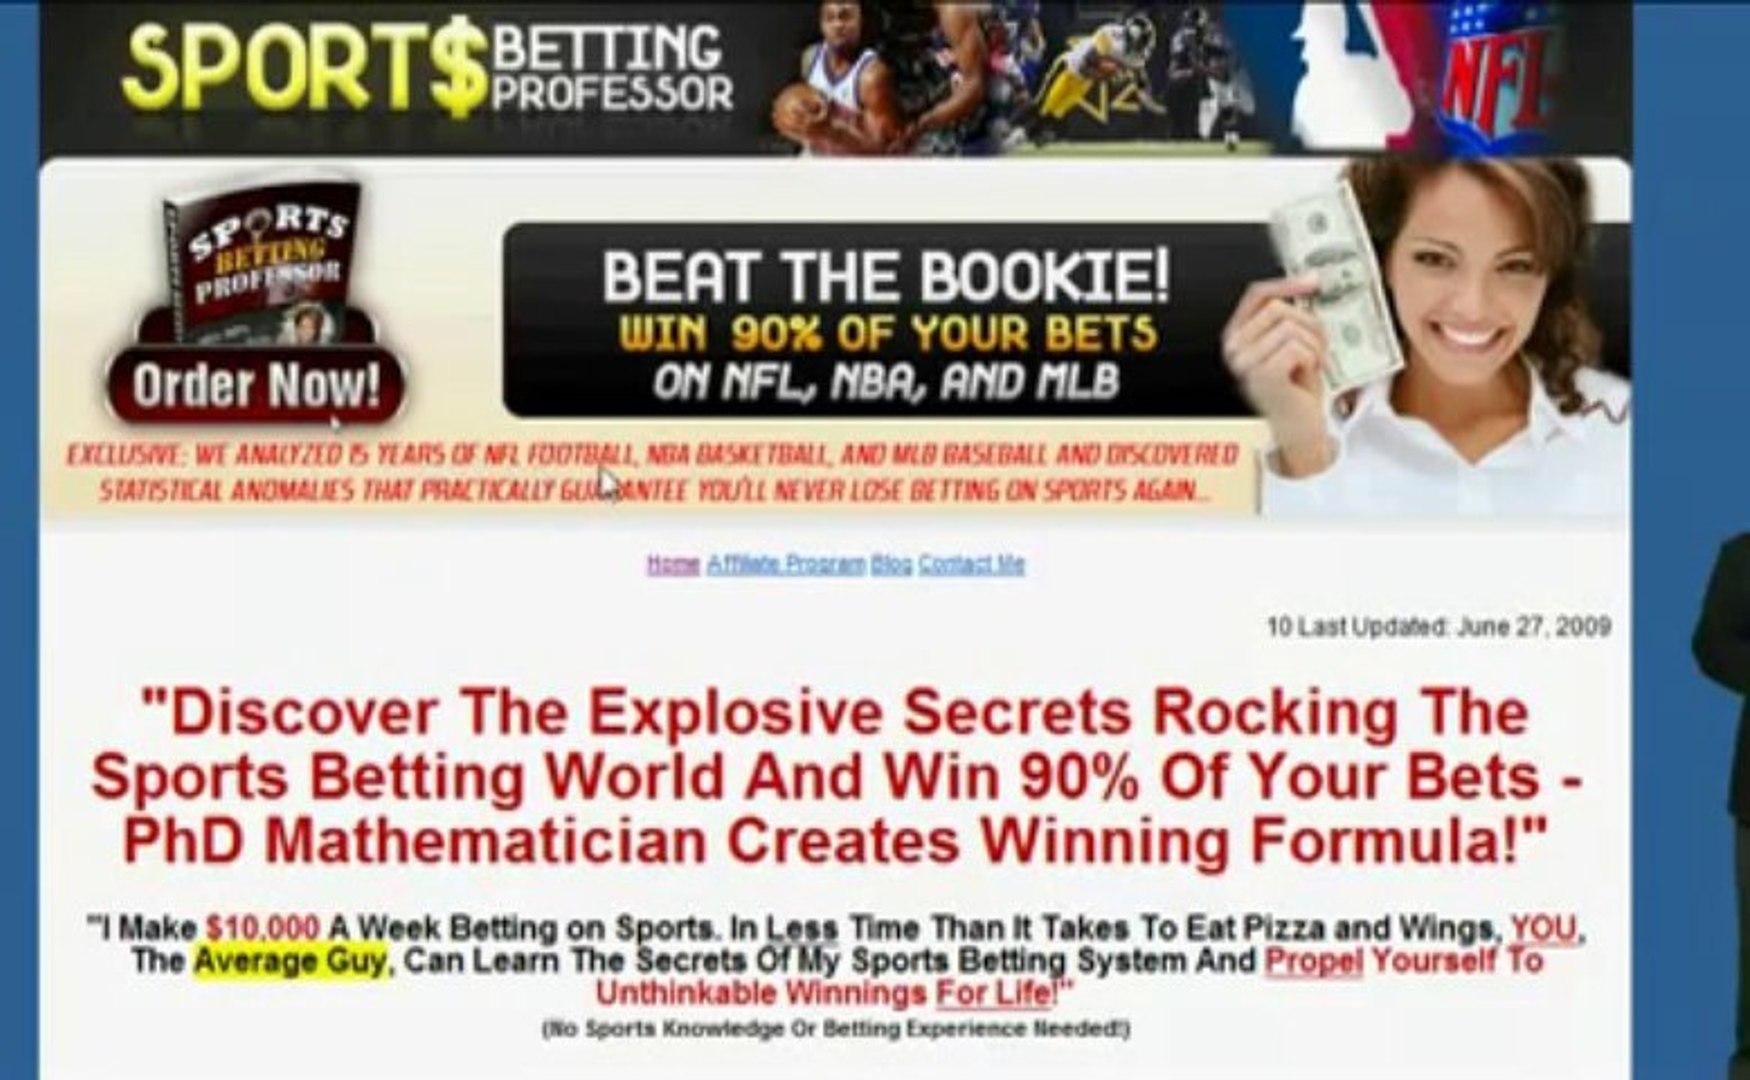 Sports betting professor nba system betting quinella betting strategy